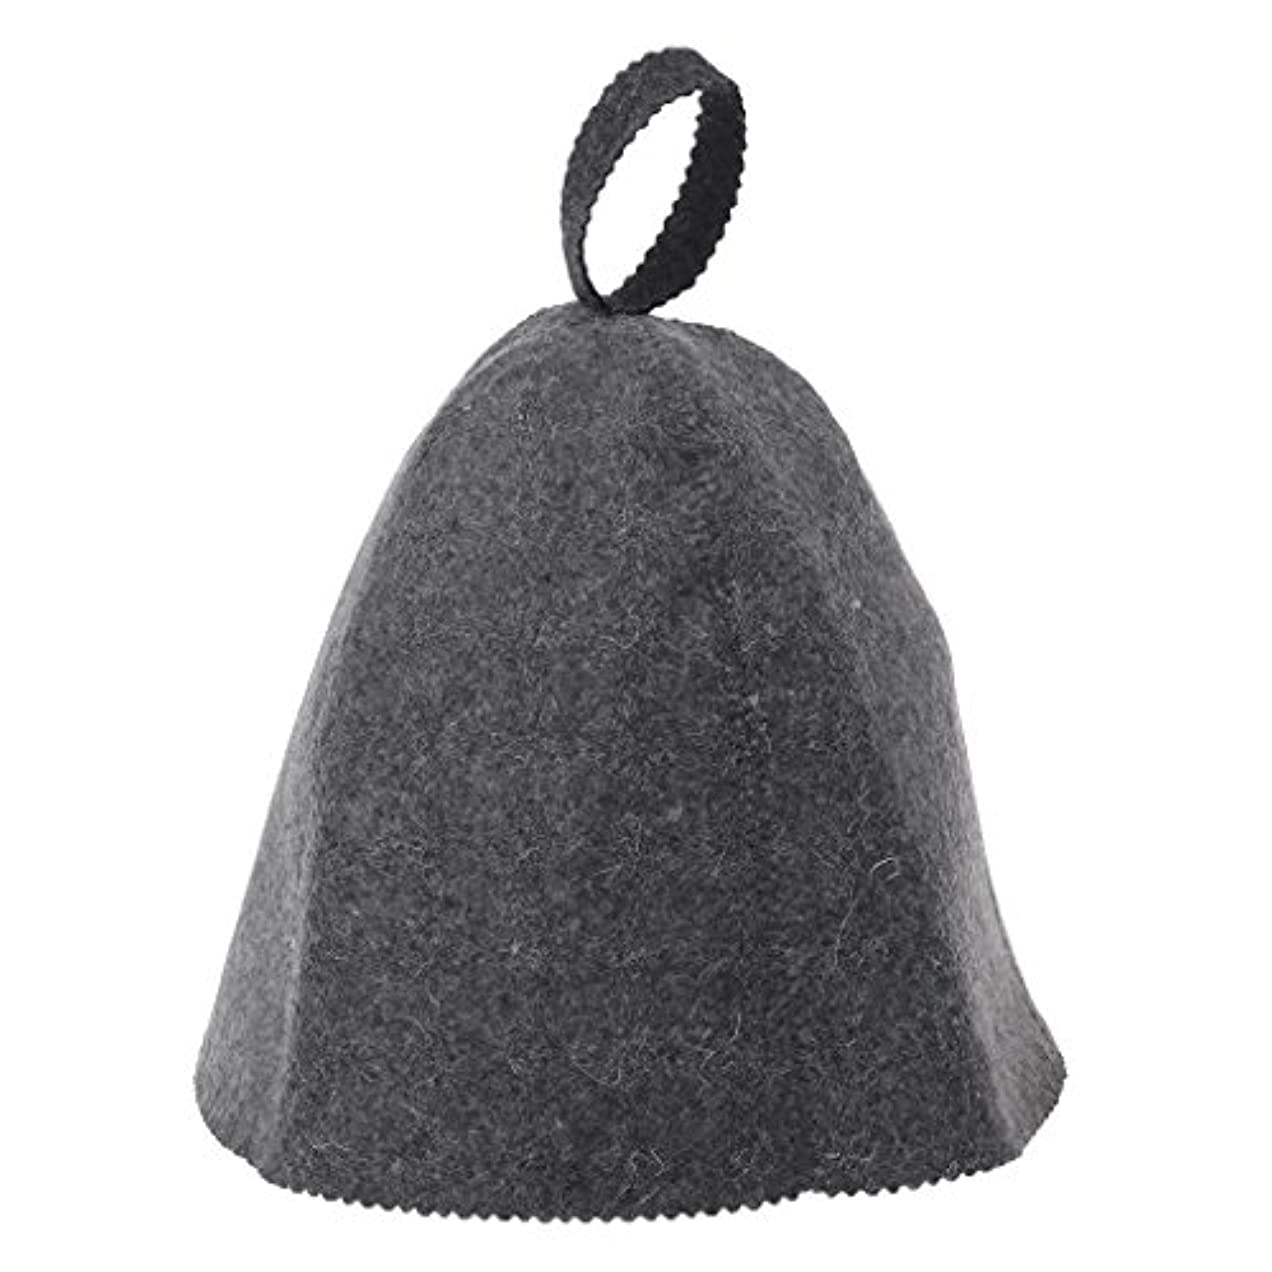 LANDUMのウールのフェルトのサウナの帽子、浴室の家の頭部の保護のための反熱ロシアのバニヤ帽子